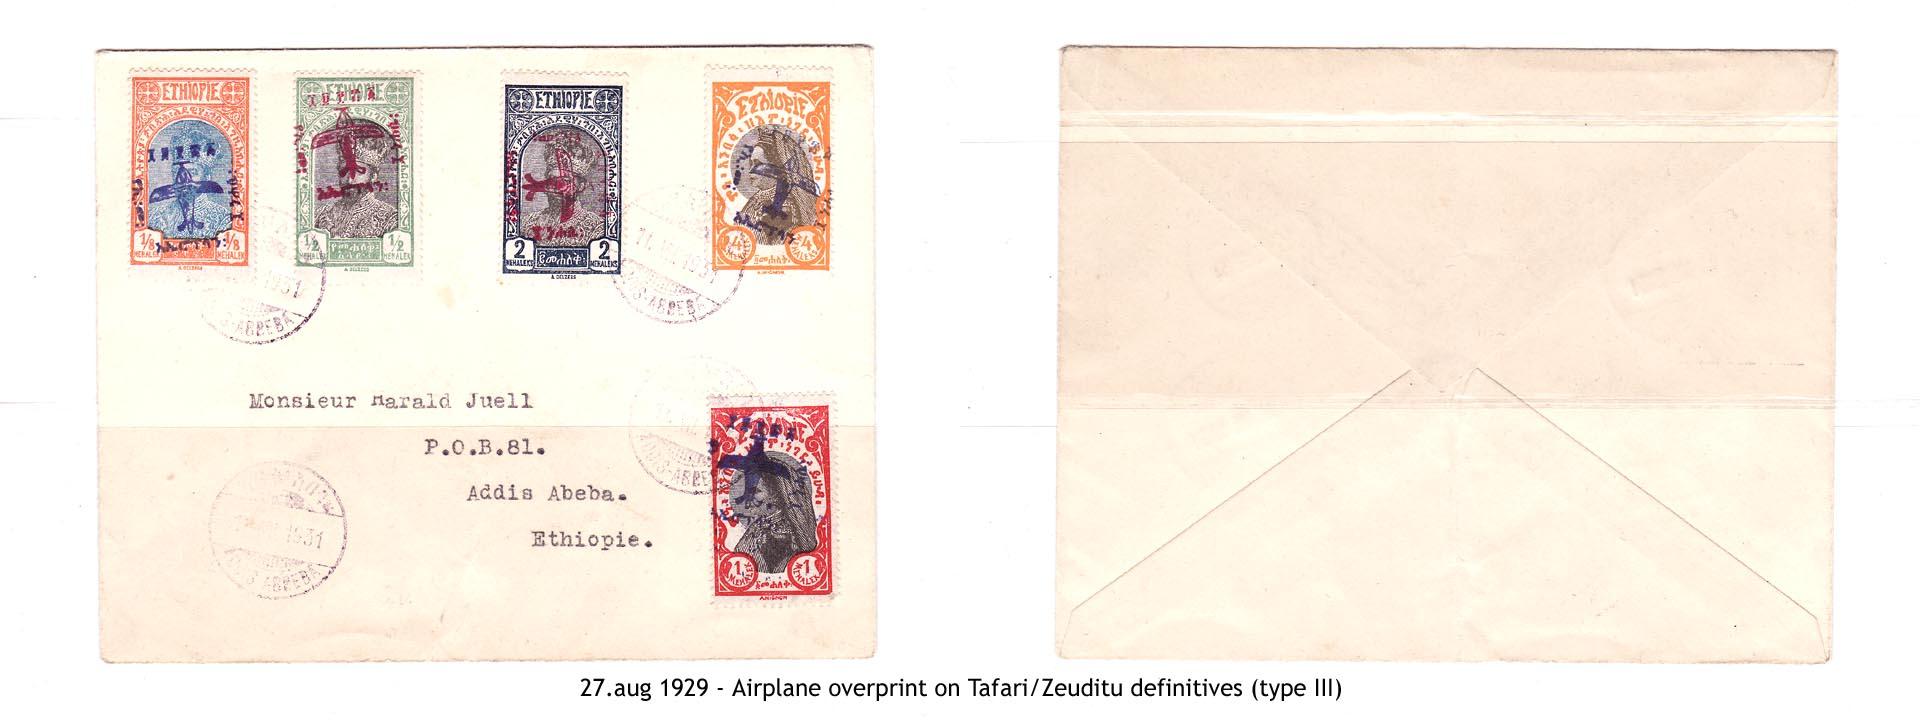 19290827 - Airplane overprint on Tafari-Zeuditu definitives Type III)